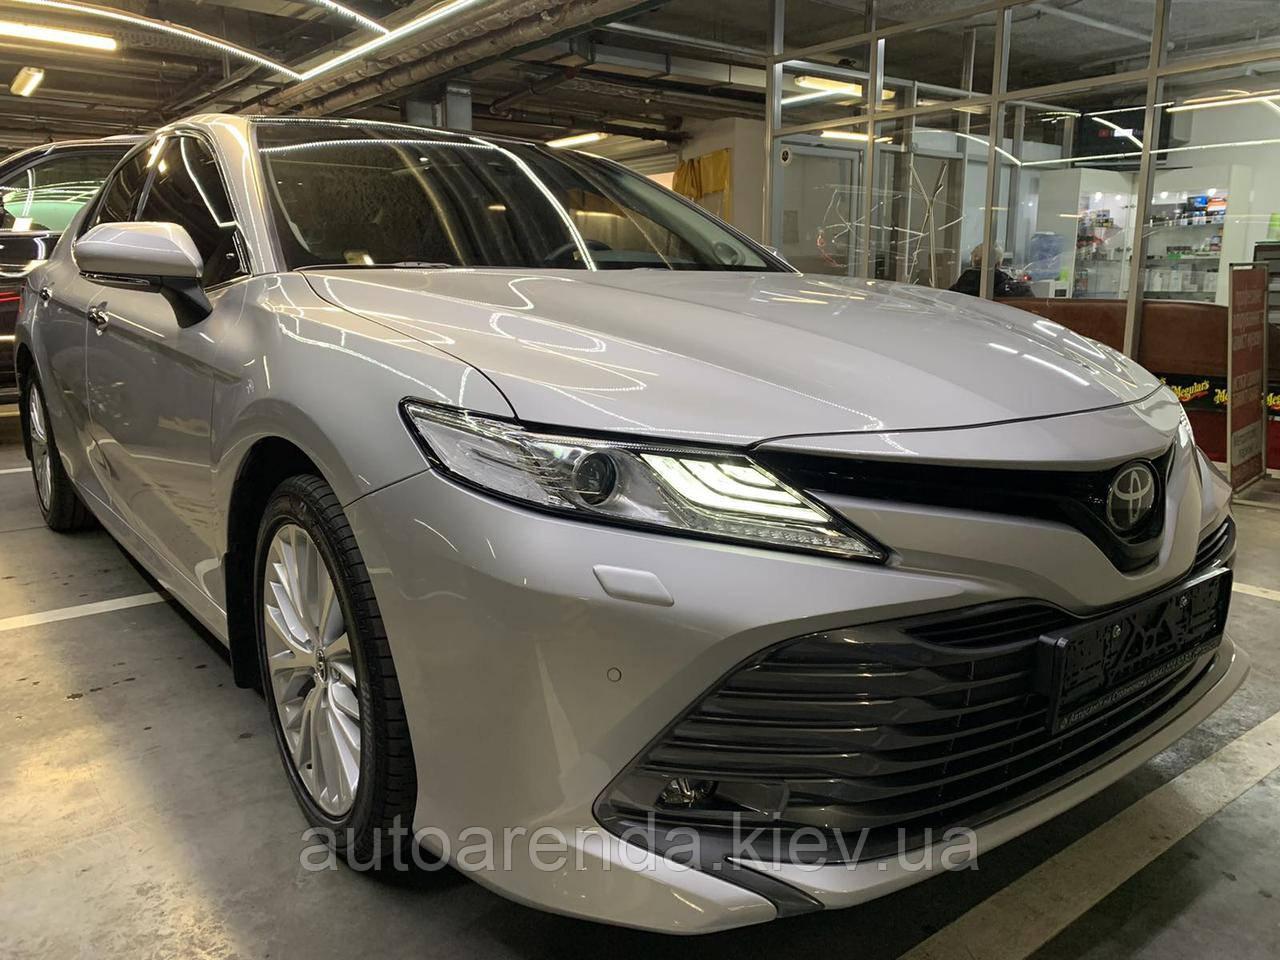 Аренда Toyota Camry V 70 (2020 года выпуска)